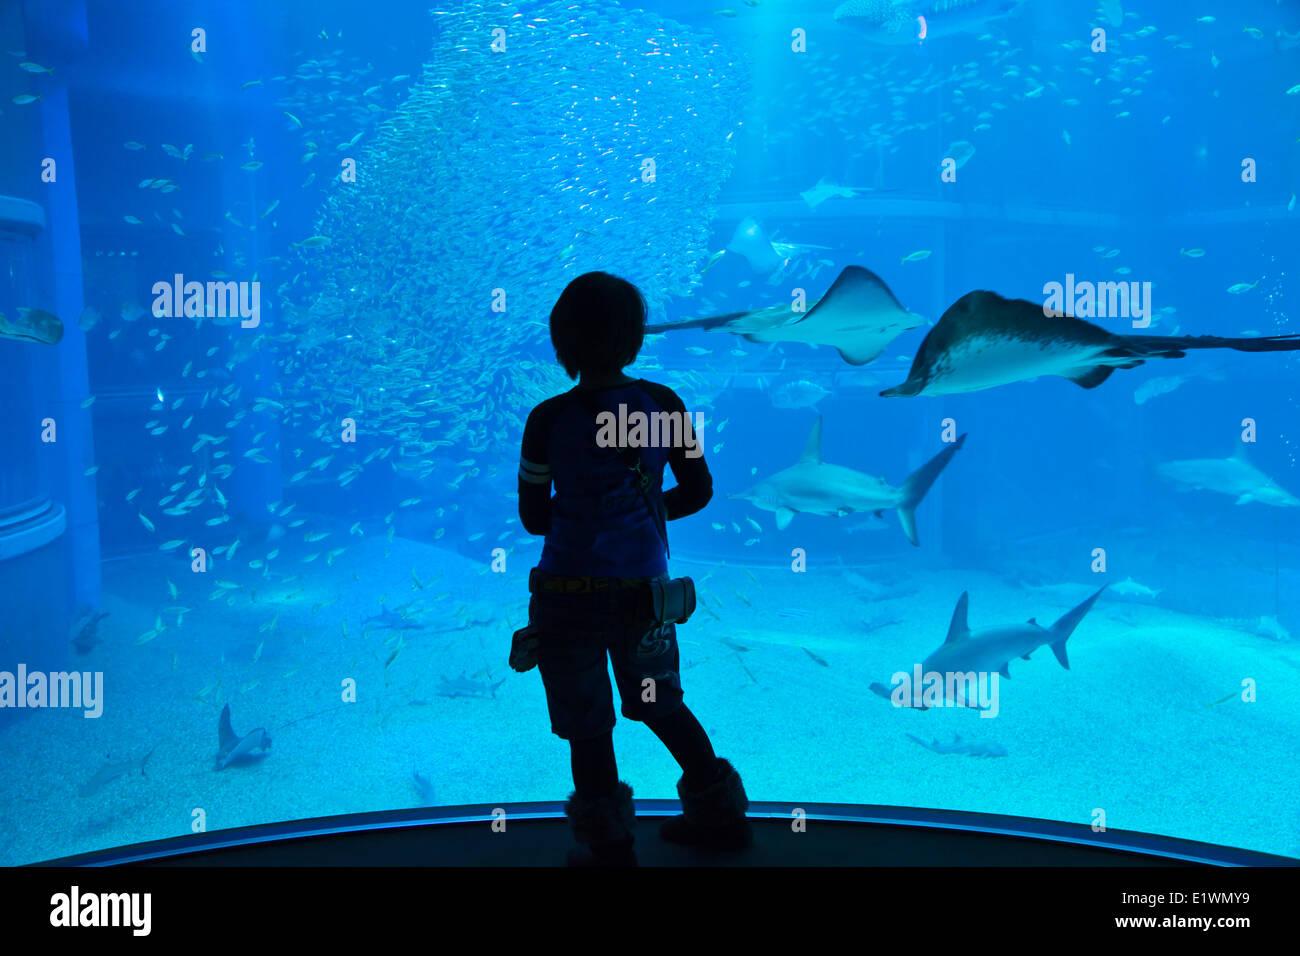 Teenager gazing as sea life in front of the 9-meter deep tank at Osaka Aquarium Kaiyukan. One of the largest public - Stock Image